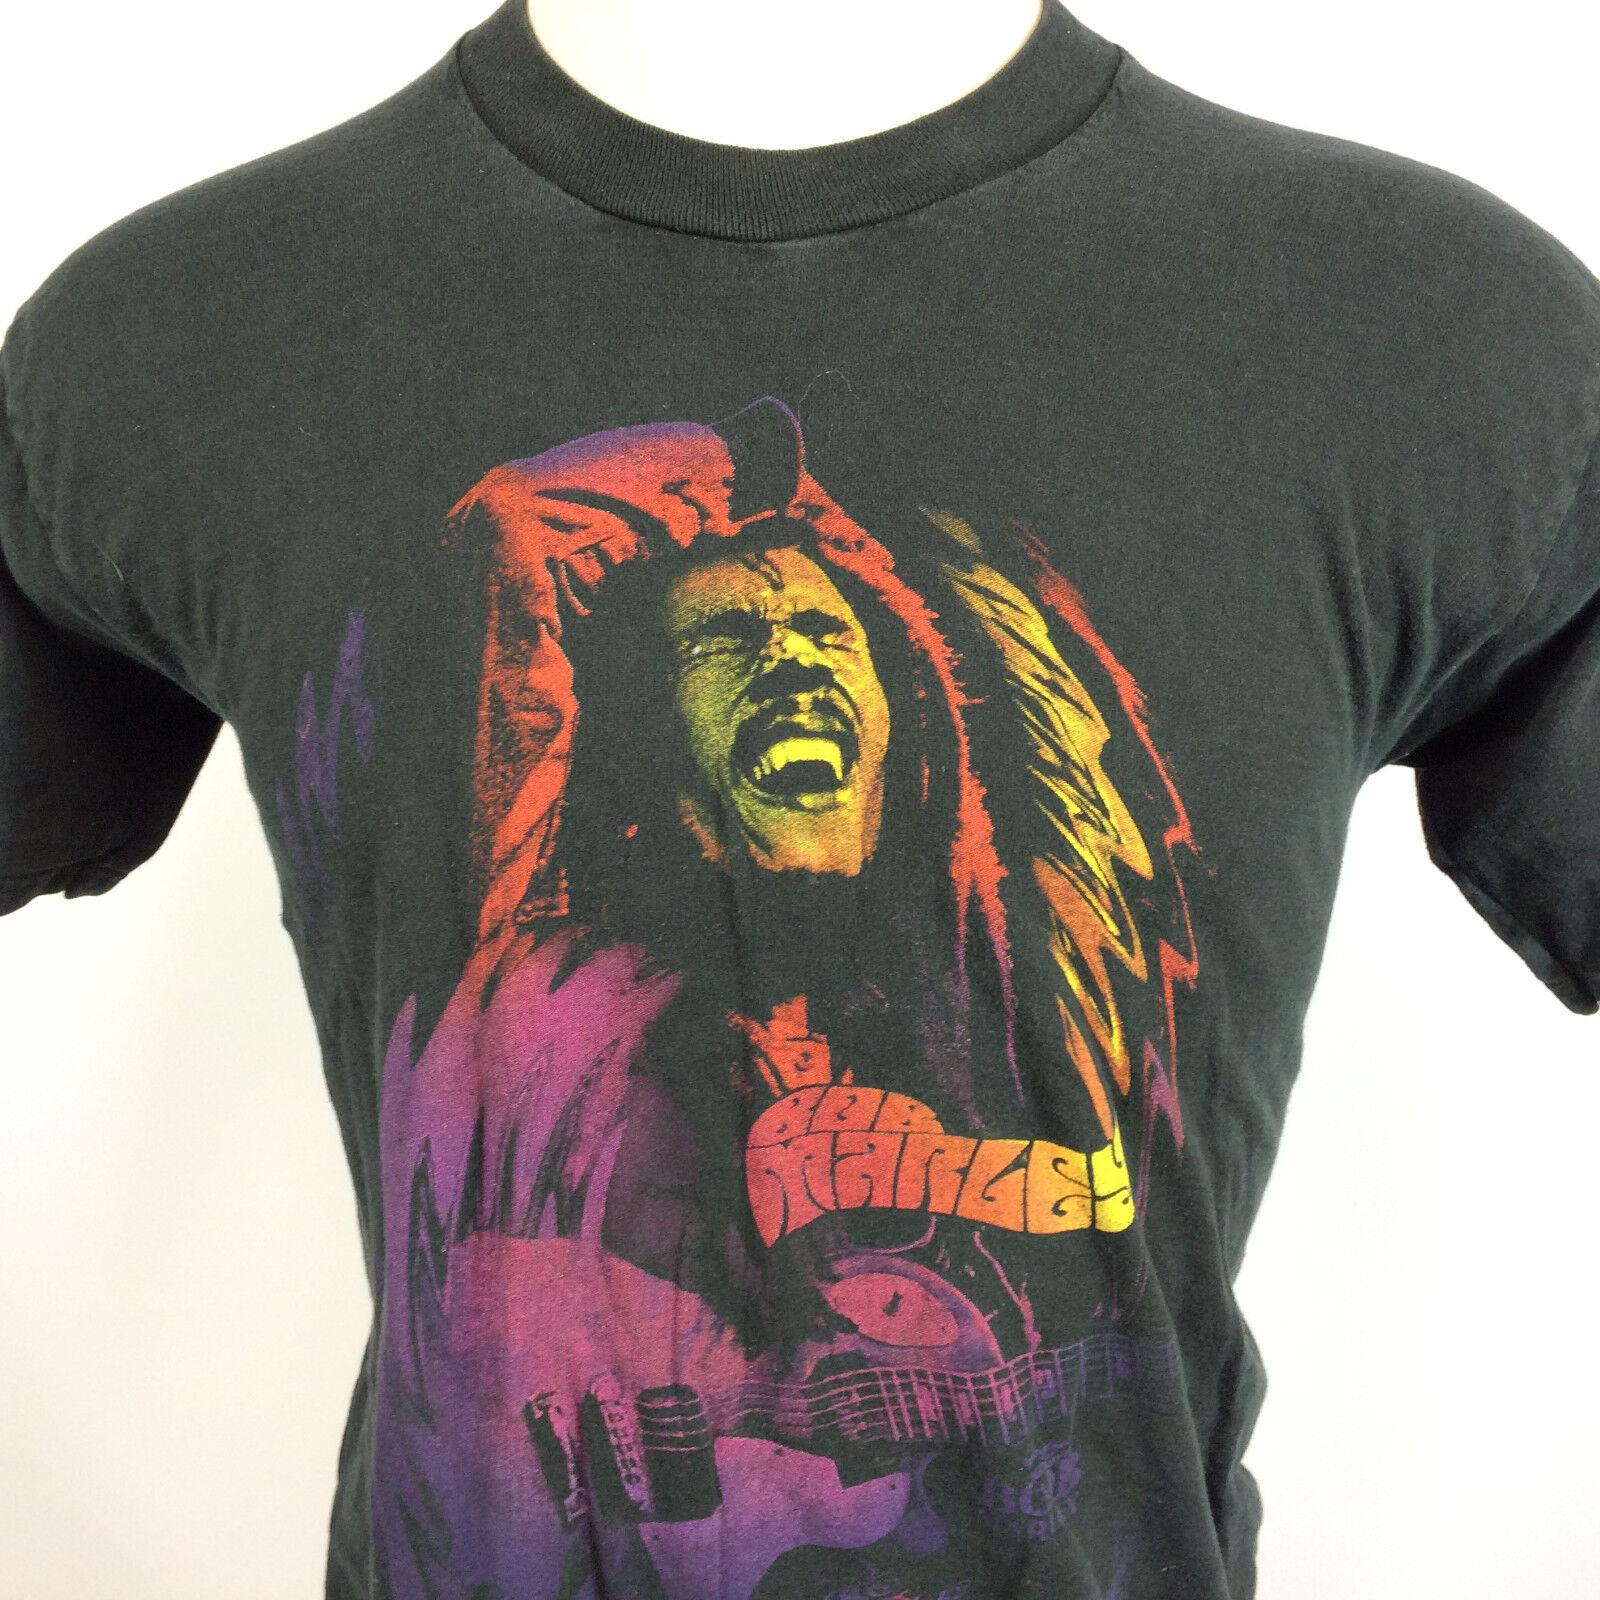 Vintage Bob Marley Distressed 1990's T Shirt Tour Concert Reggae Music Rasta